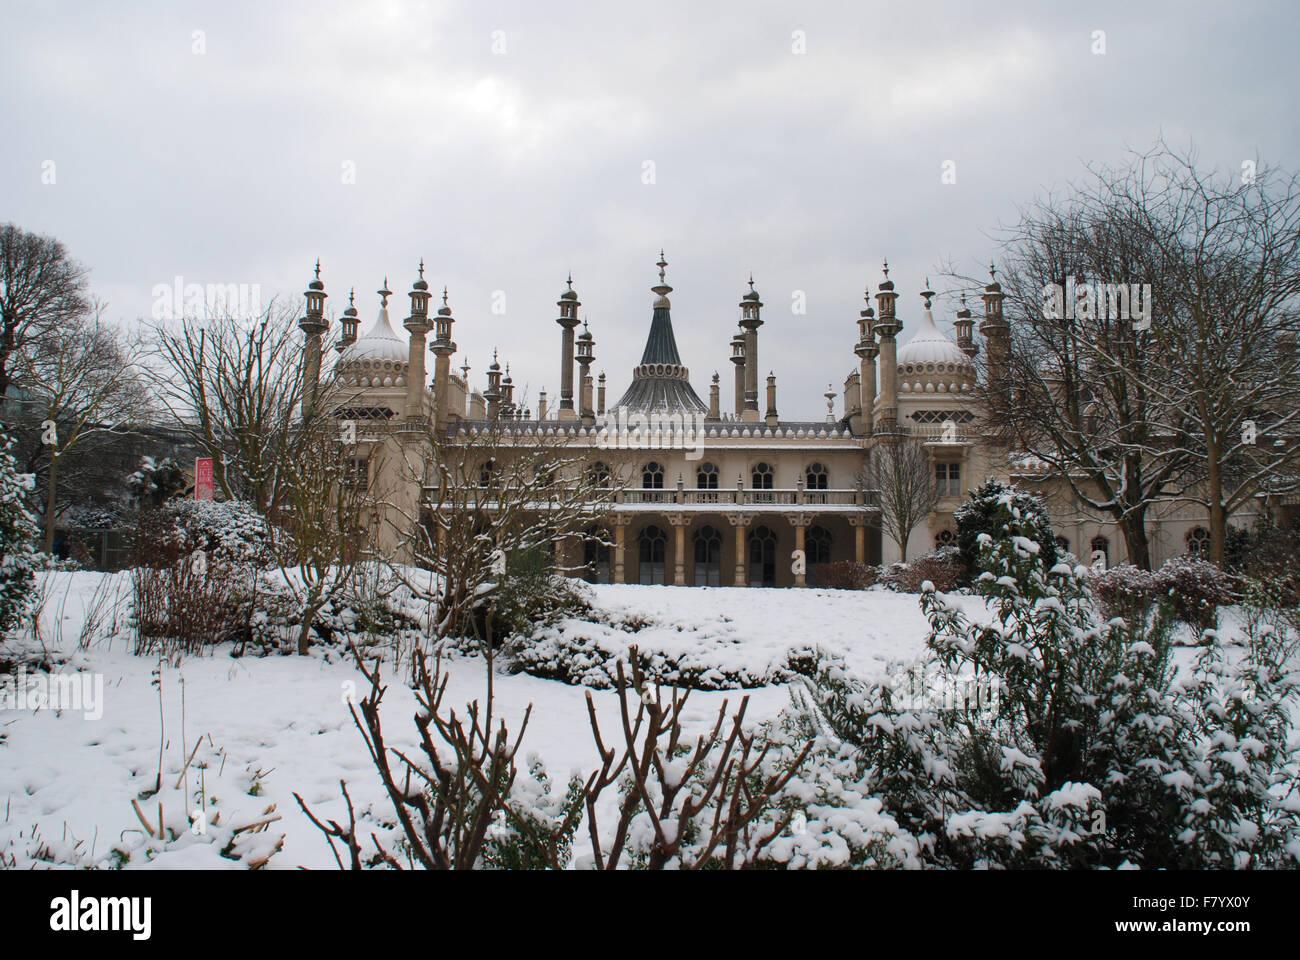 Brighton Pavilion in the snow Stock Photo